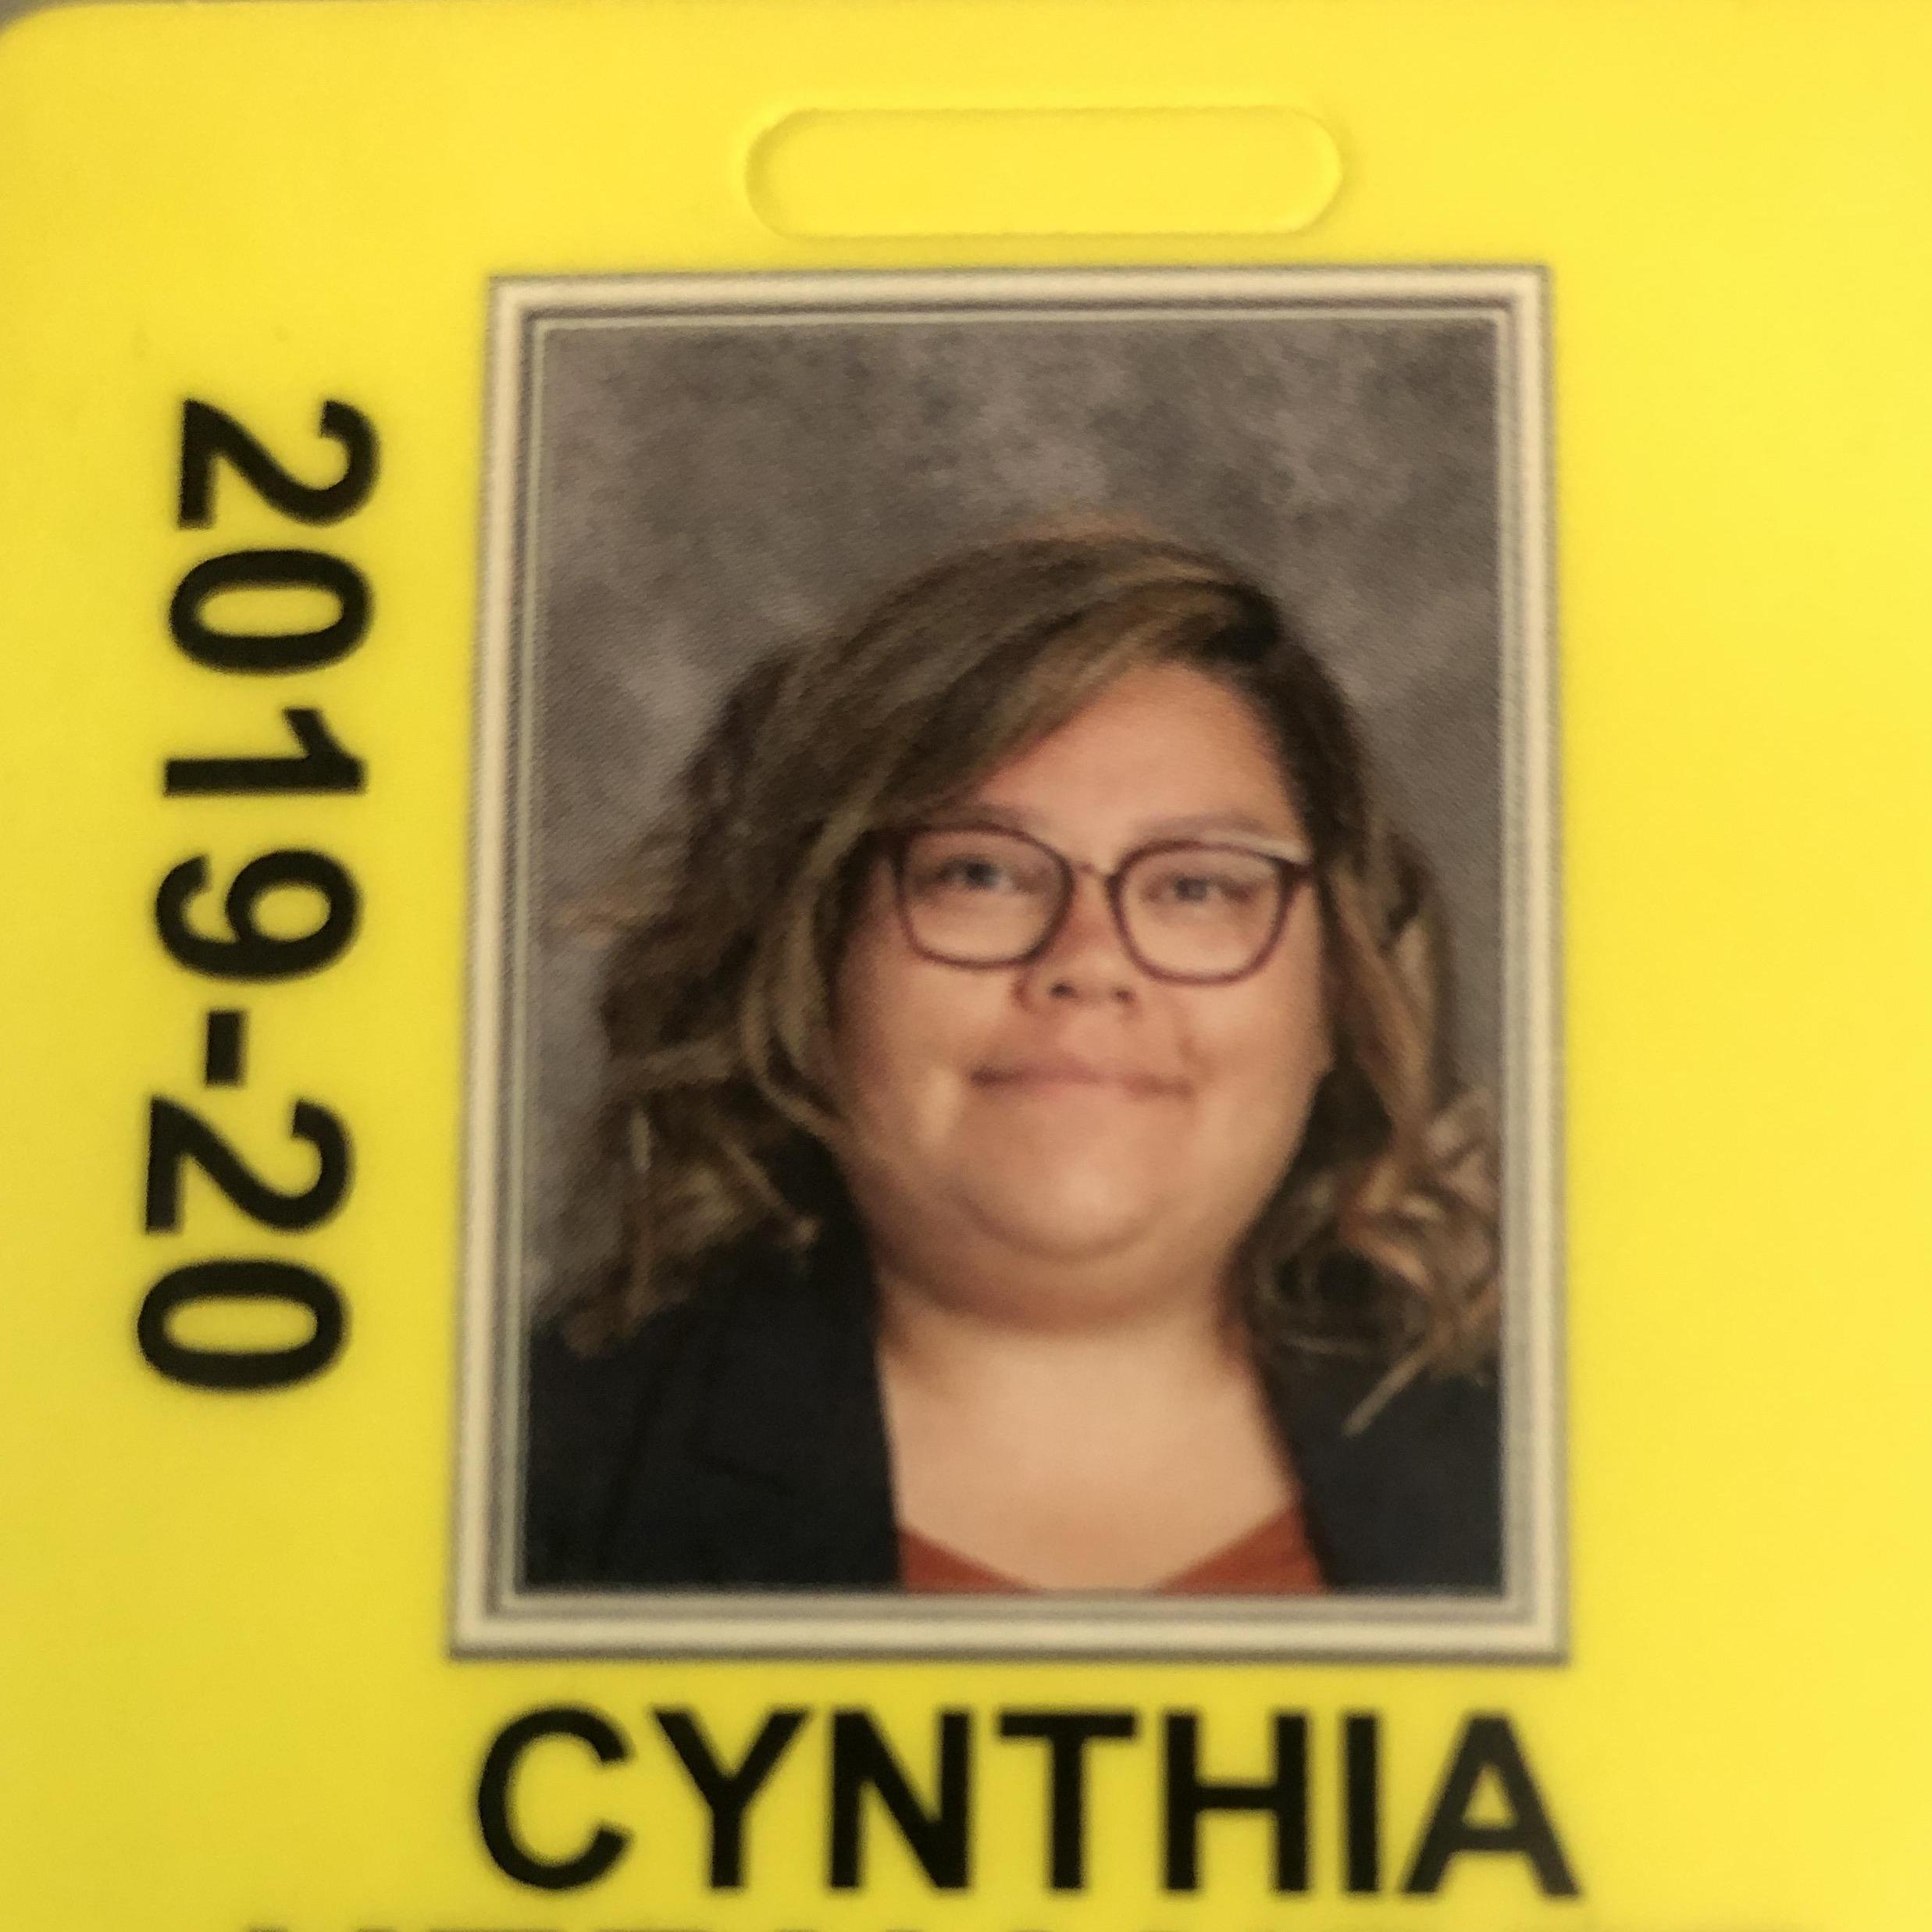 Ms. Cynthia's Profile Photo